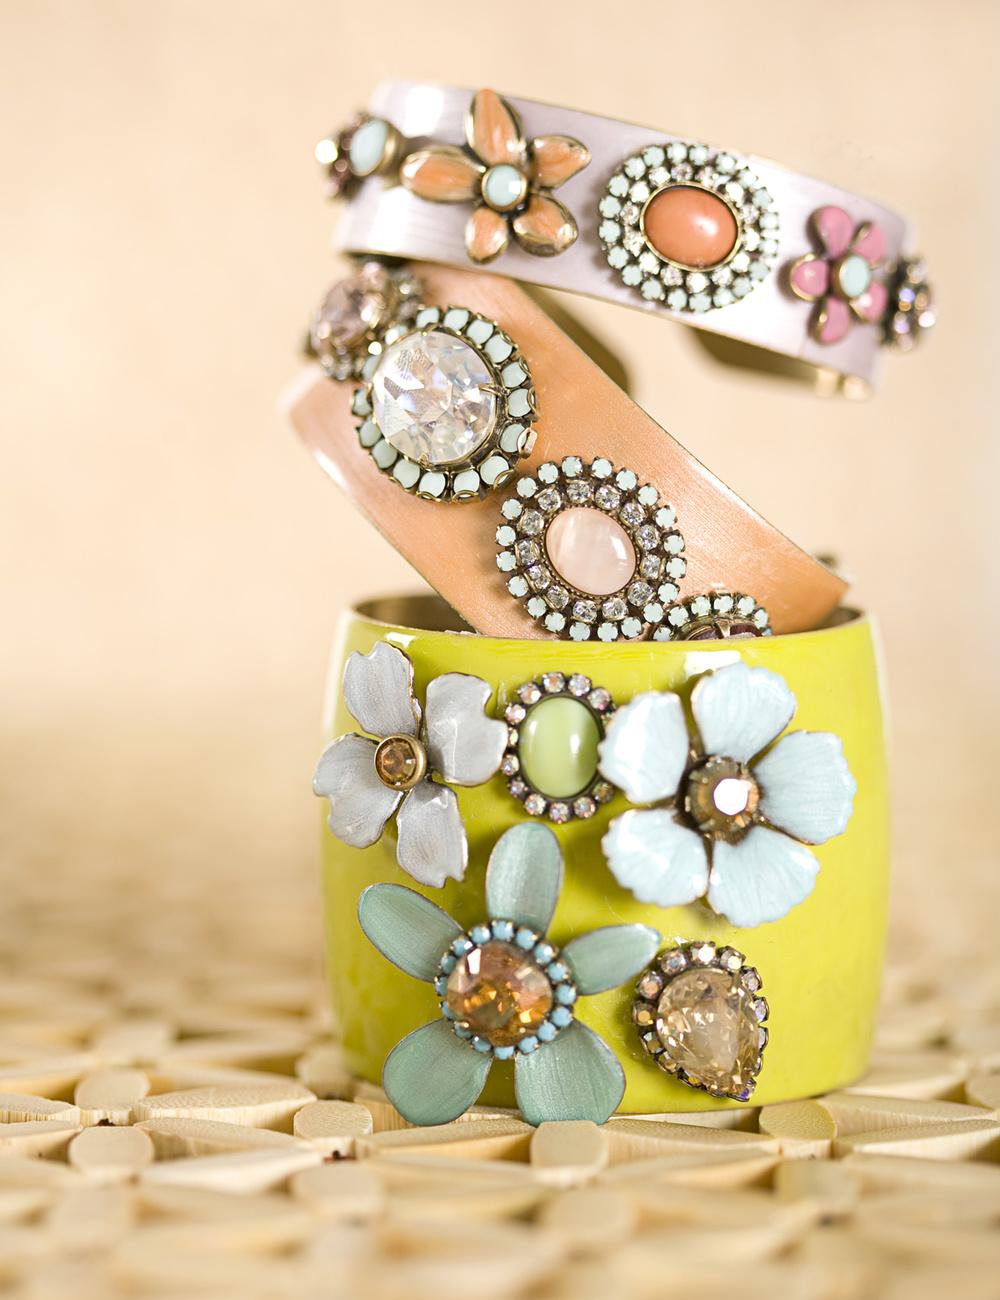 Jewelry_Cuffs.jpg